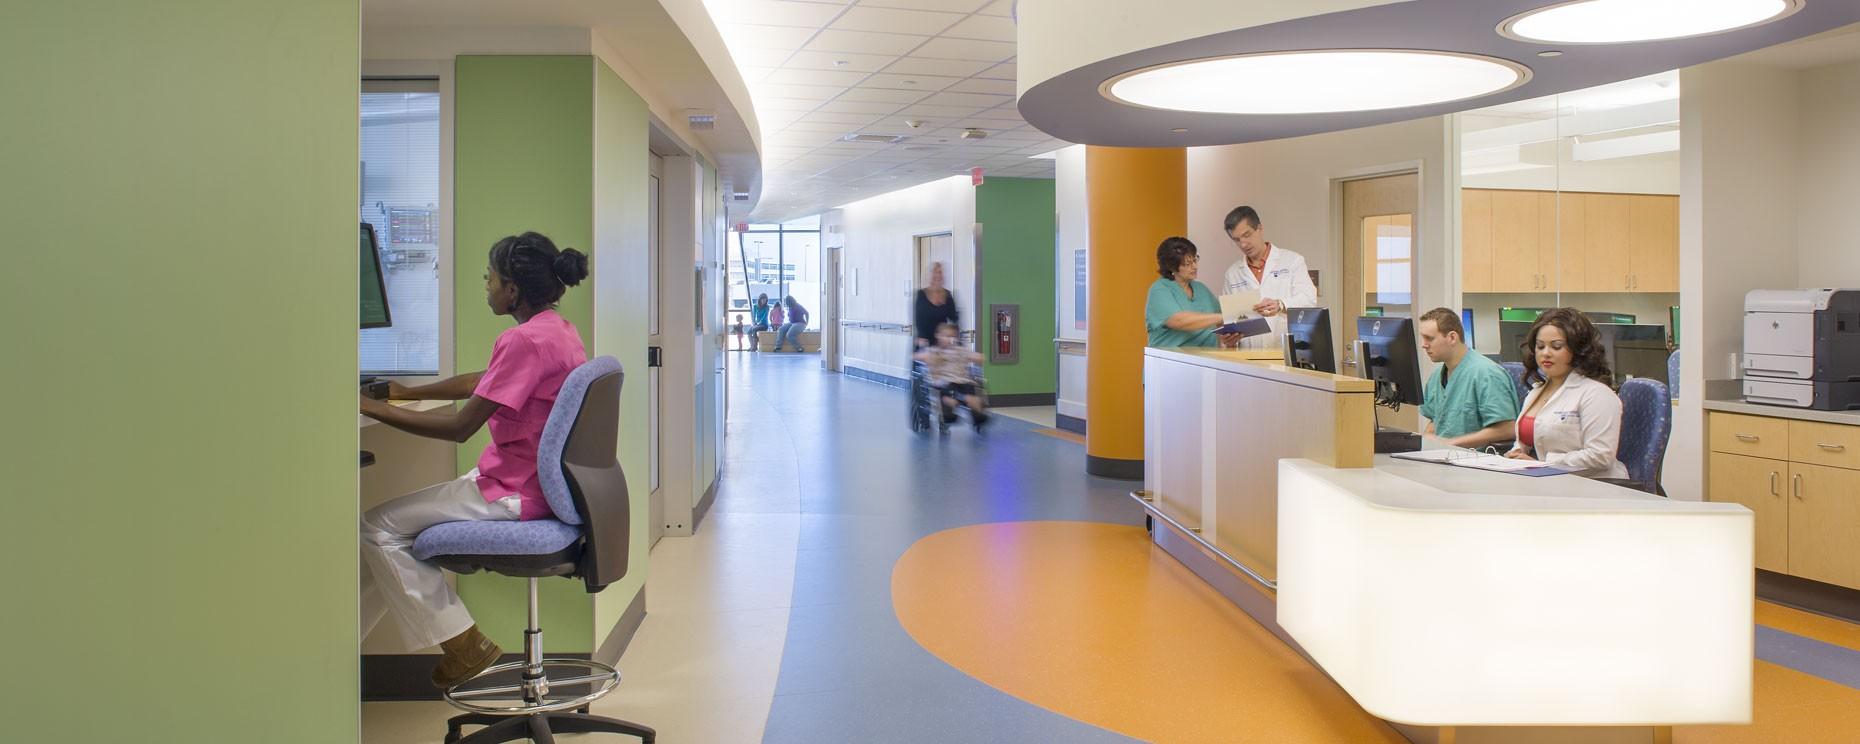 corian-hospital-corridor